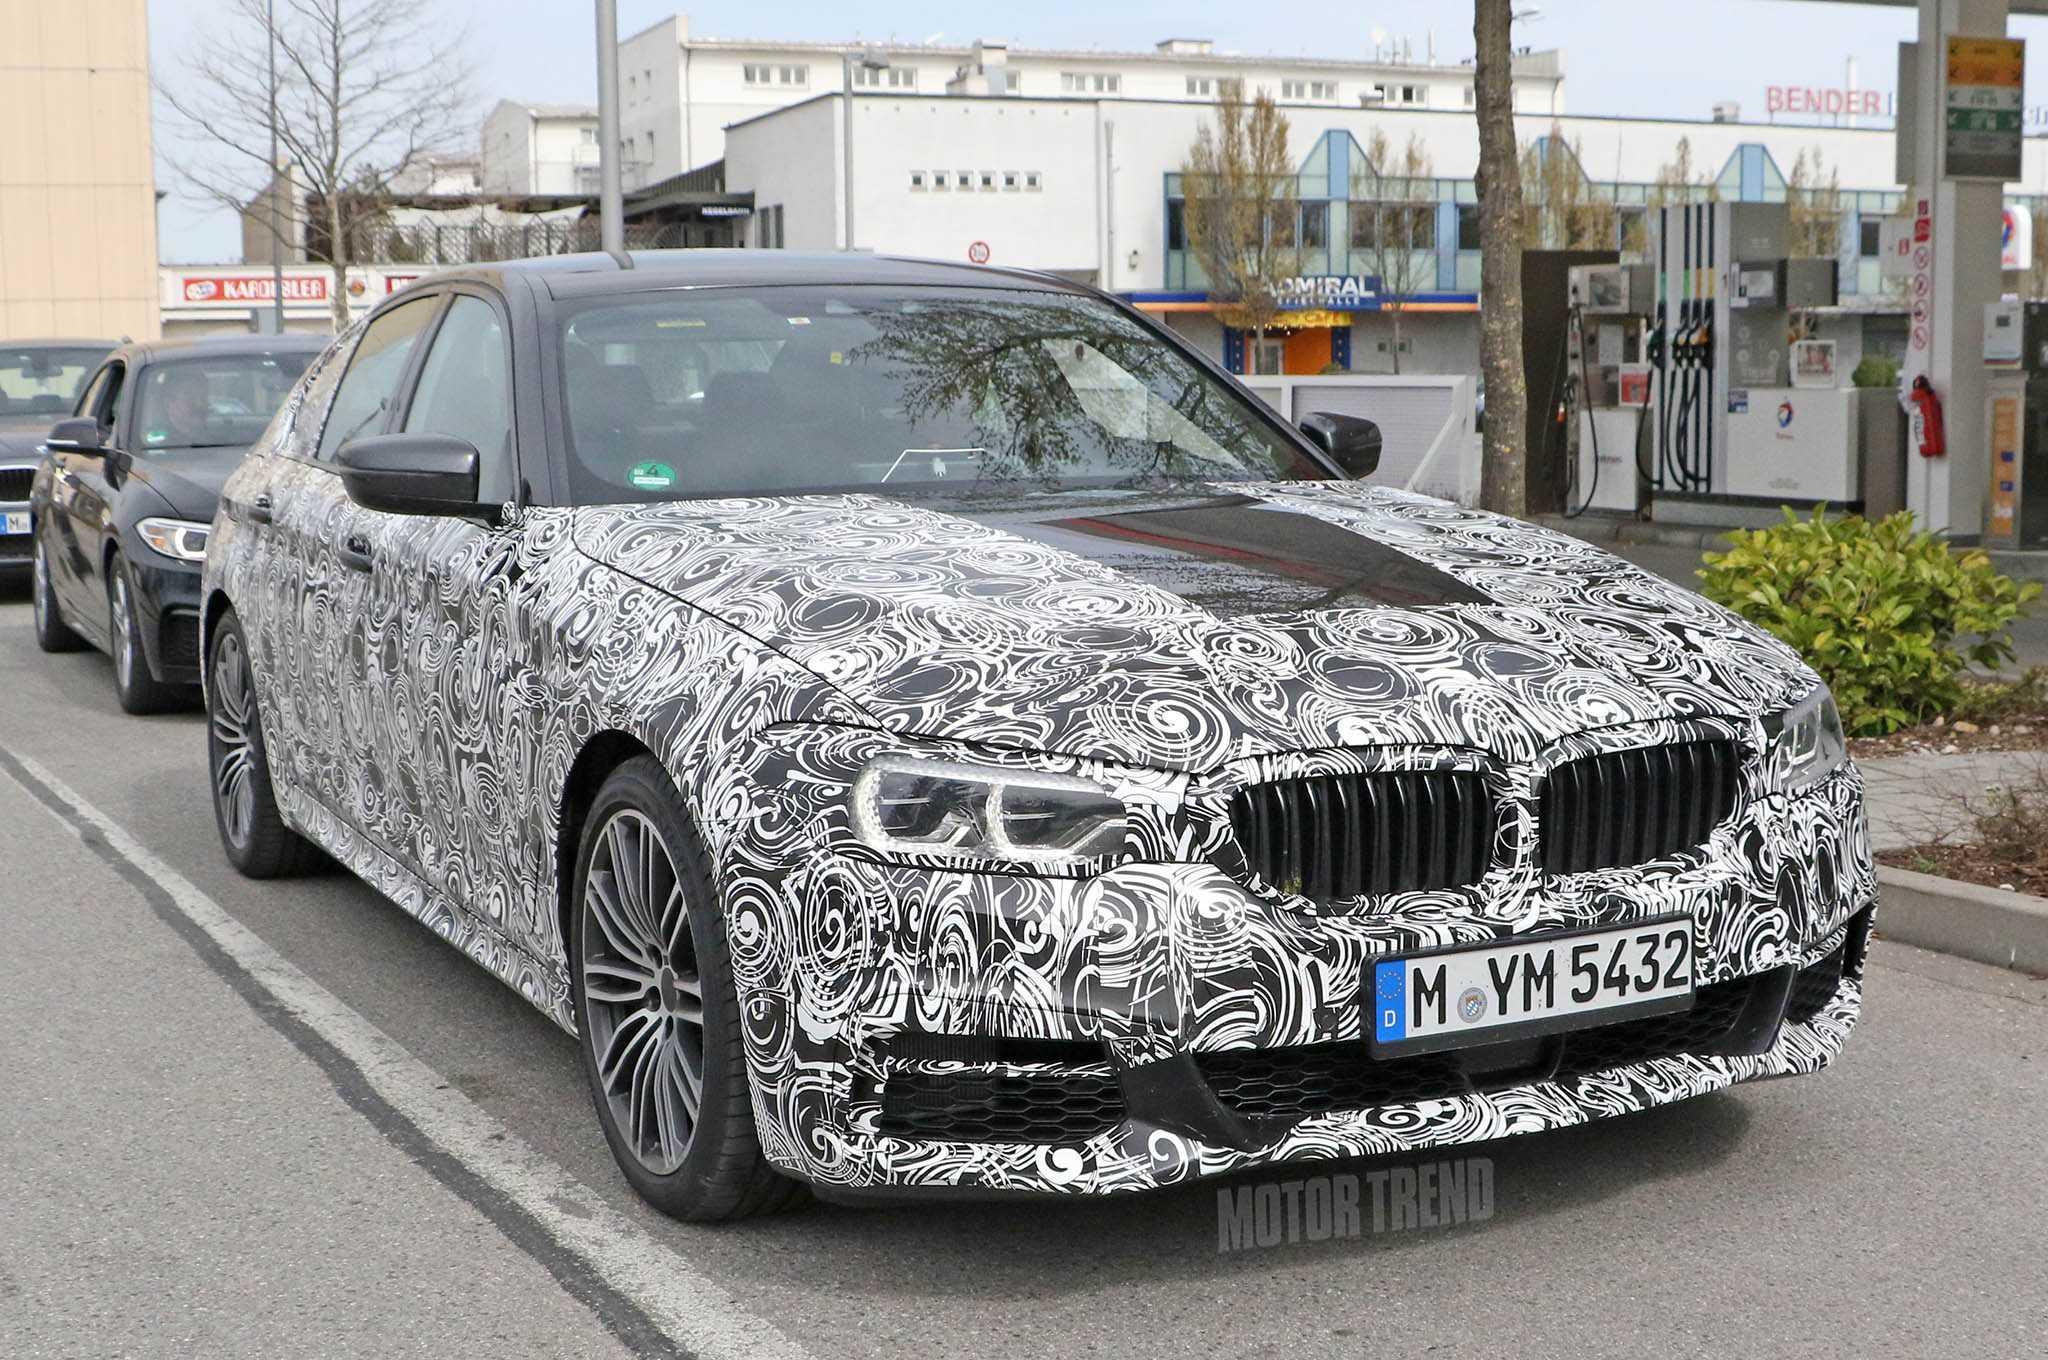 2017 BMW 5 Series Upgraded with Semi-Autonomous Tech